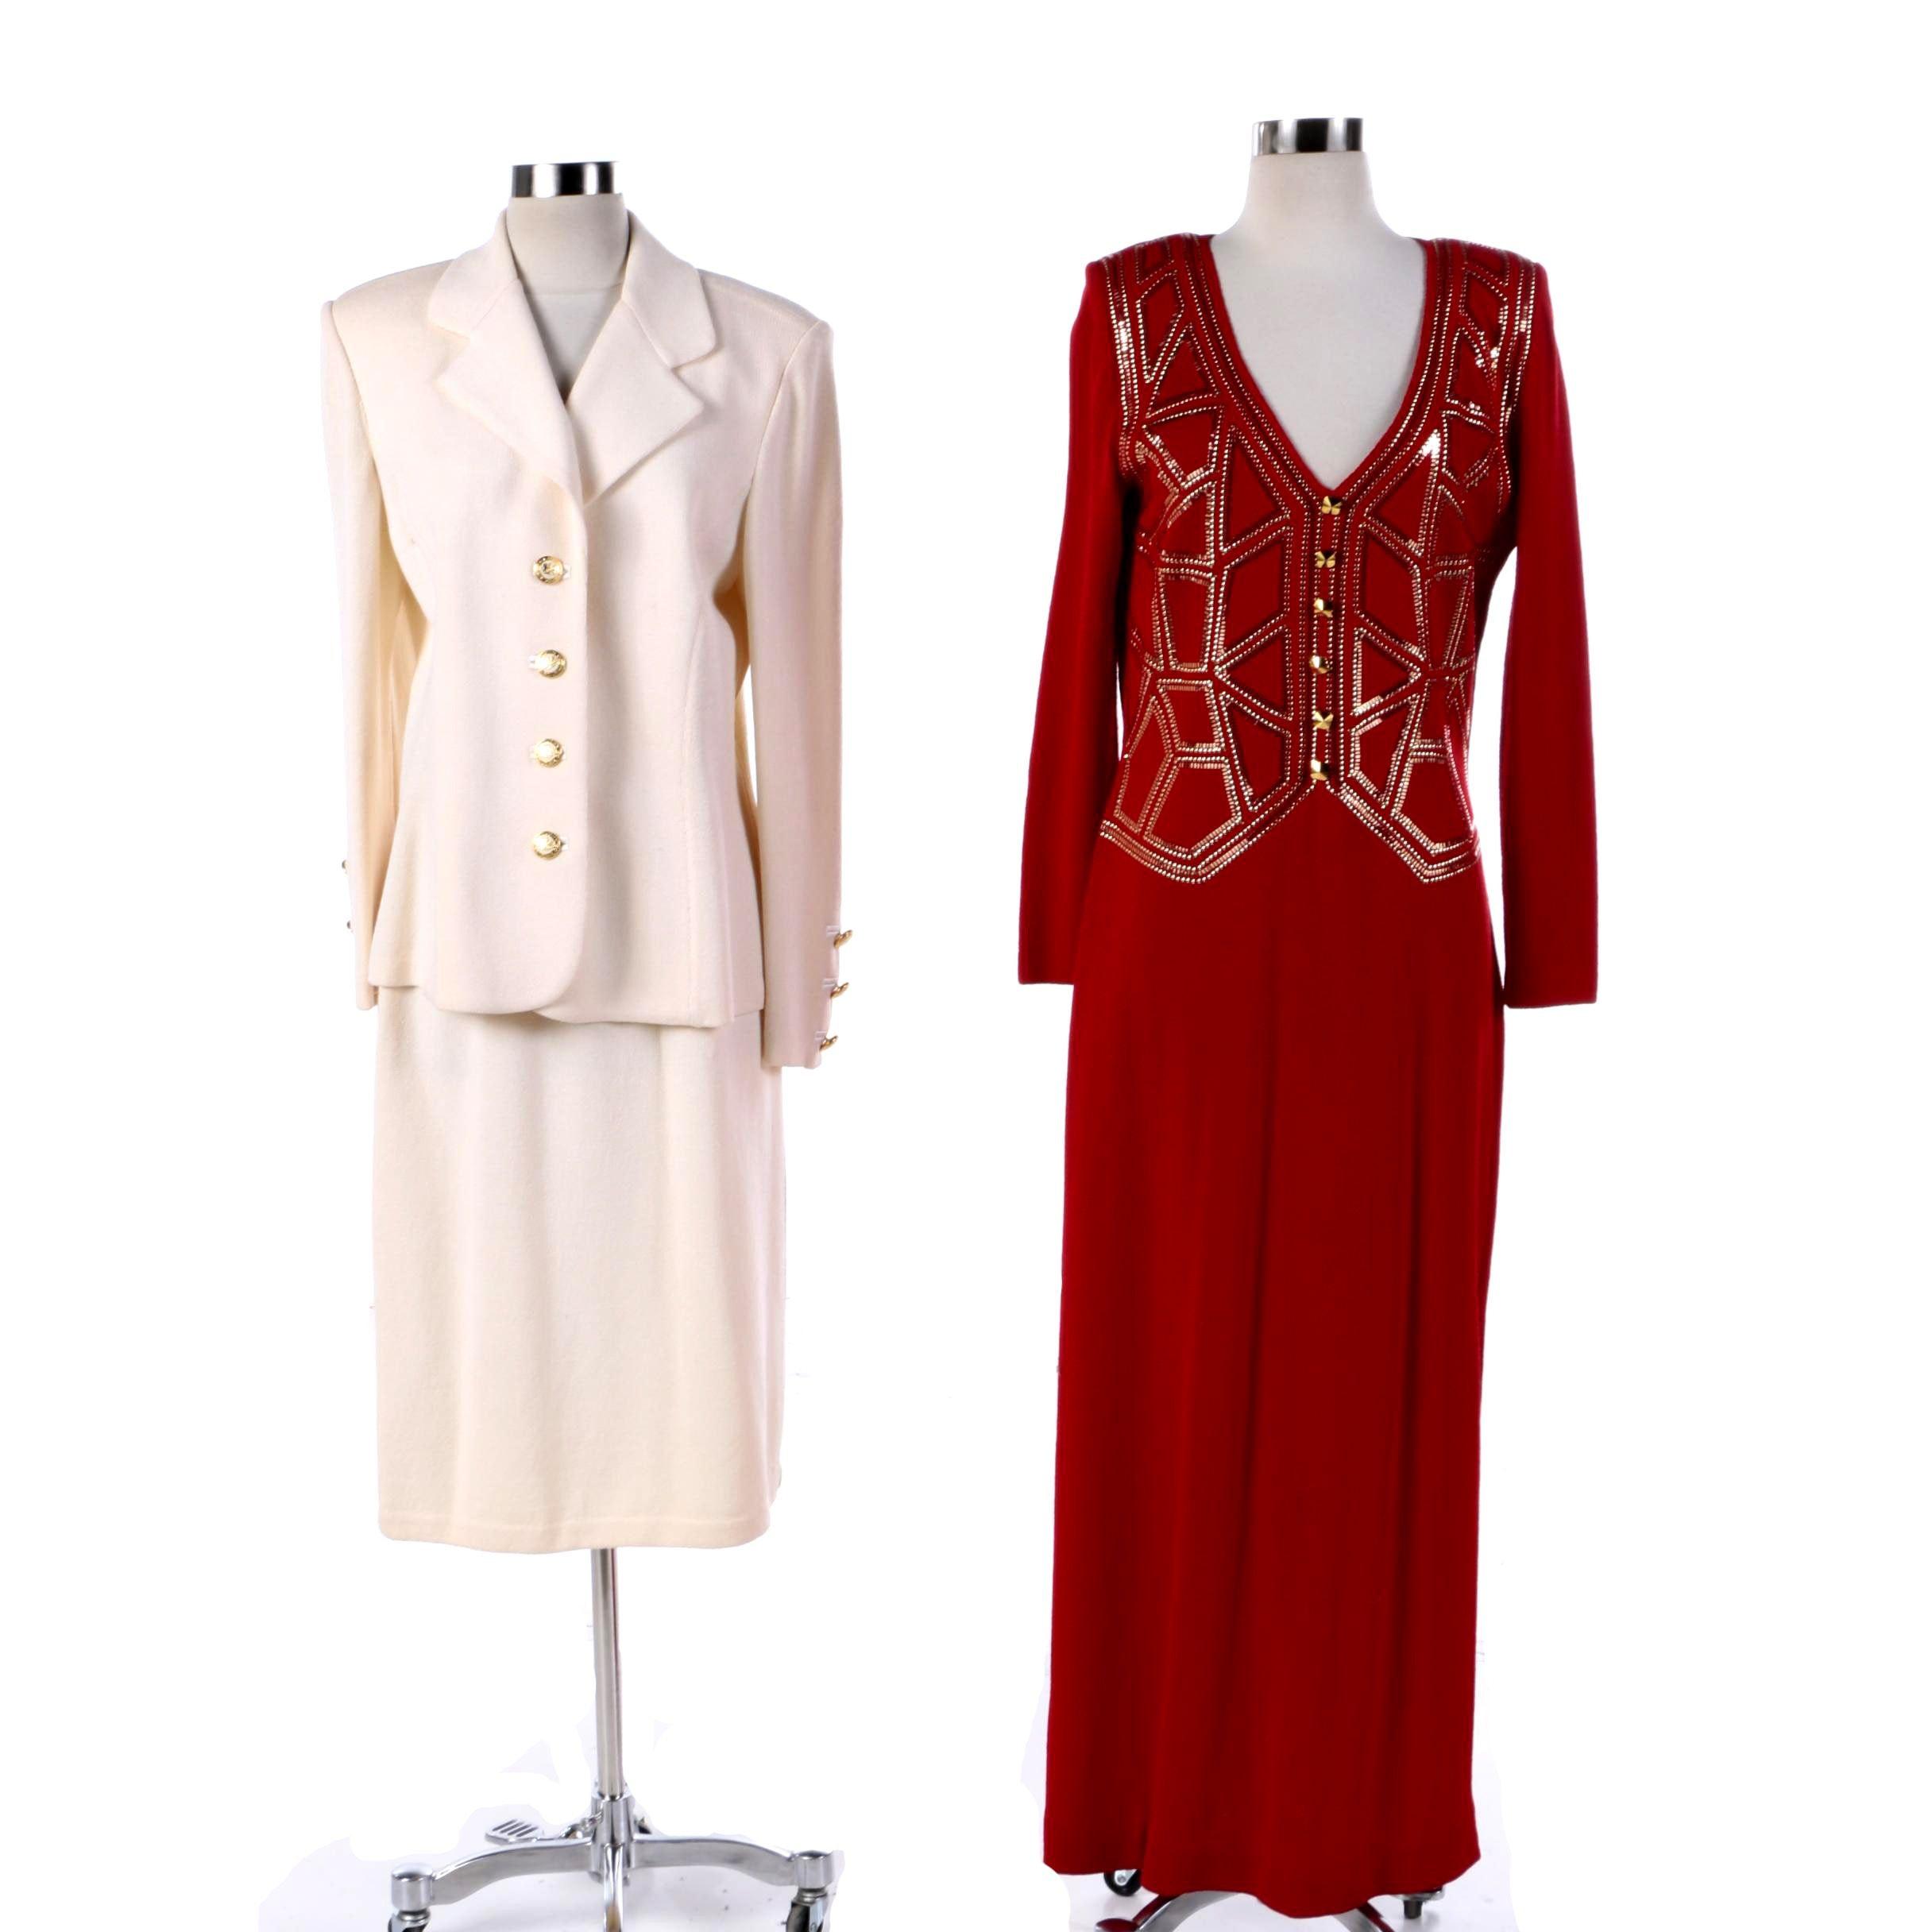 St. John Evening Dress and St. John Basics Skirt Suit